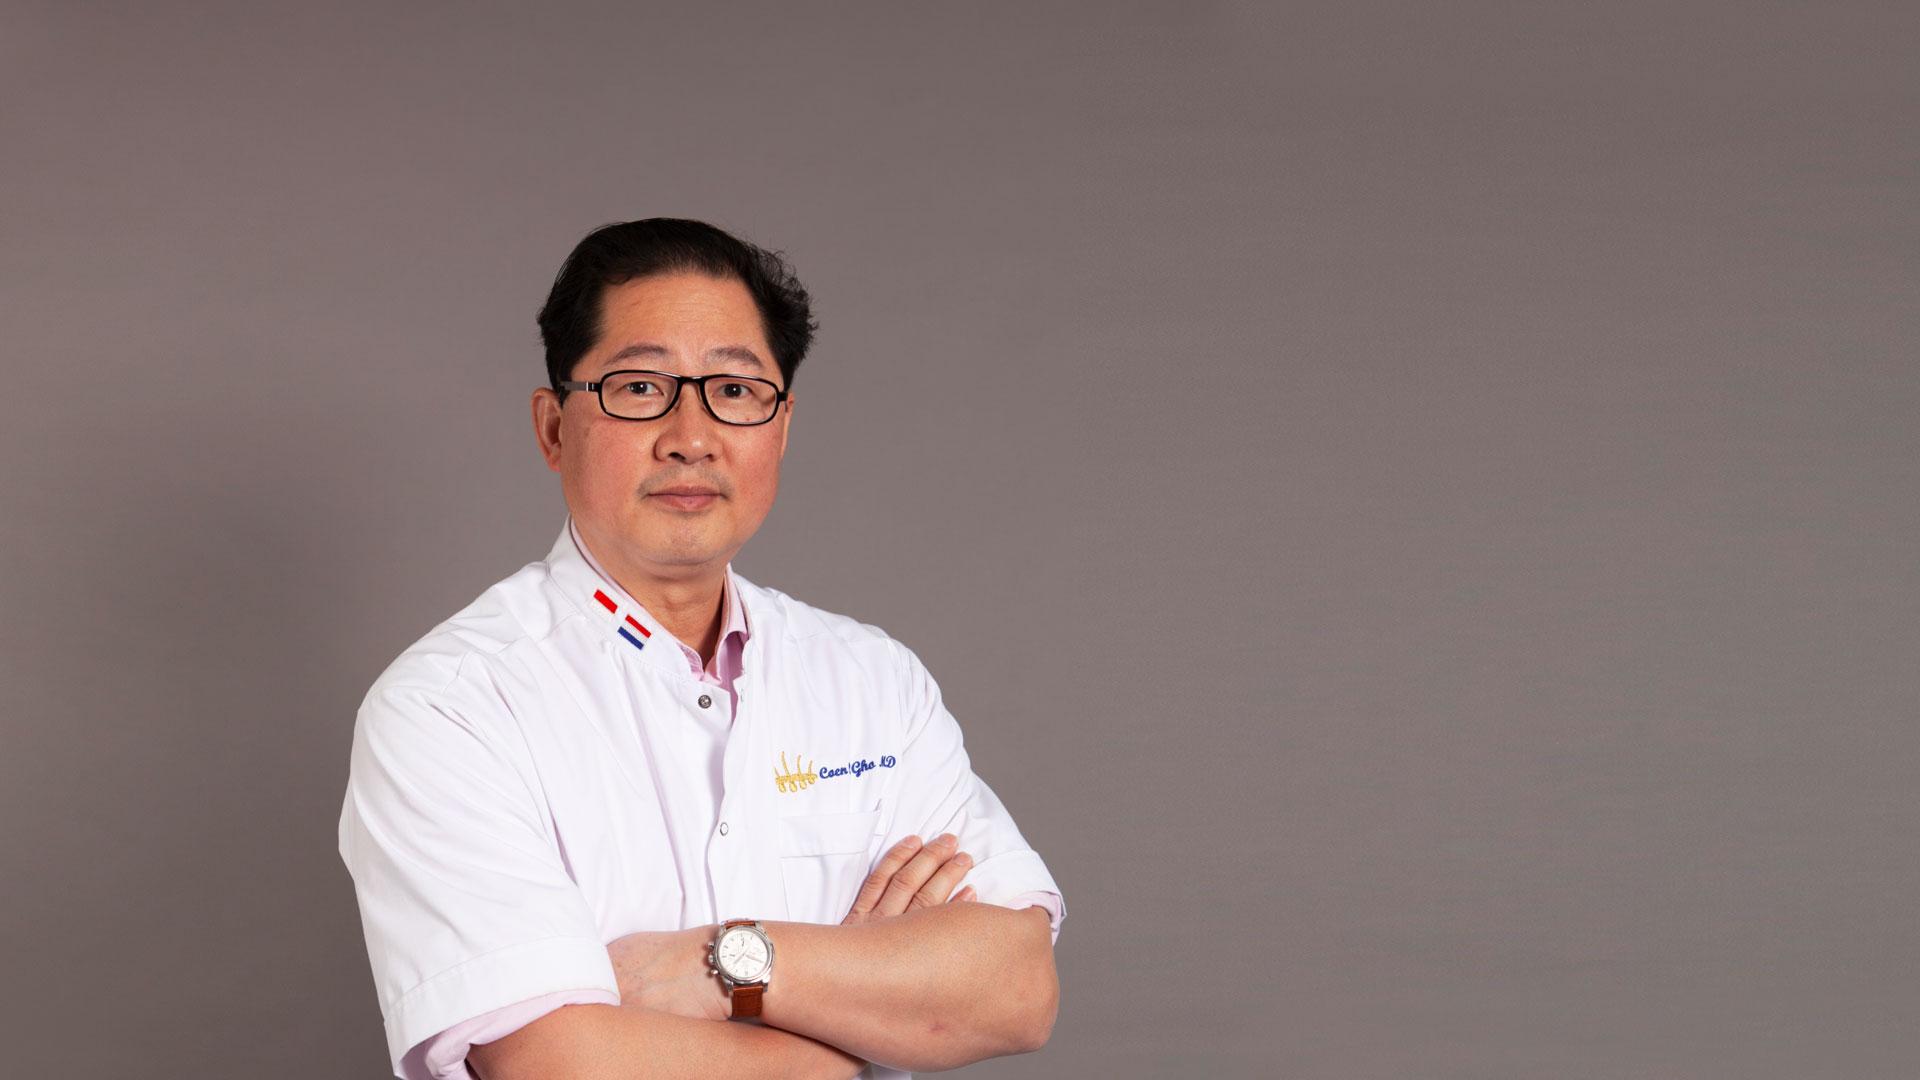 Dr. Coen Gho